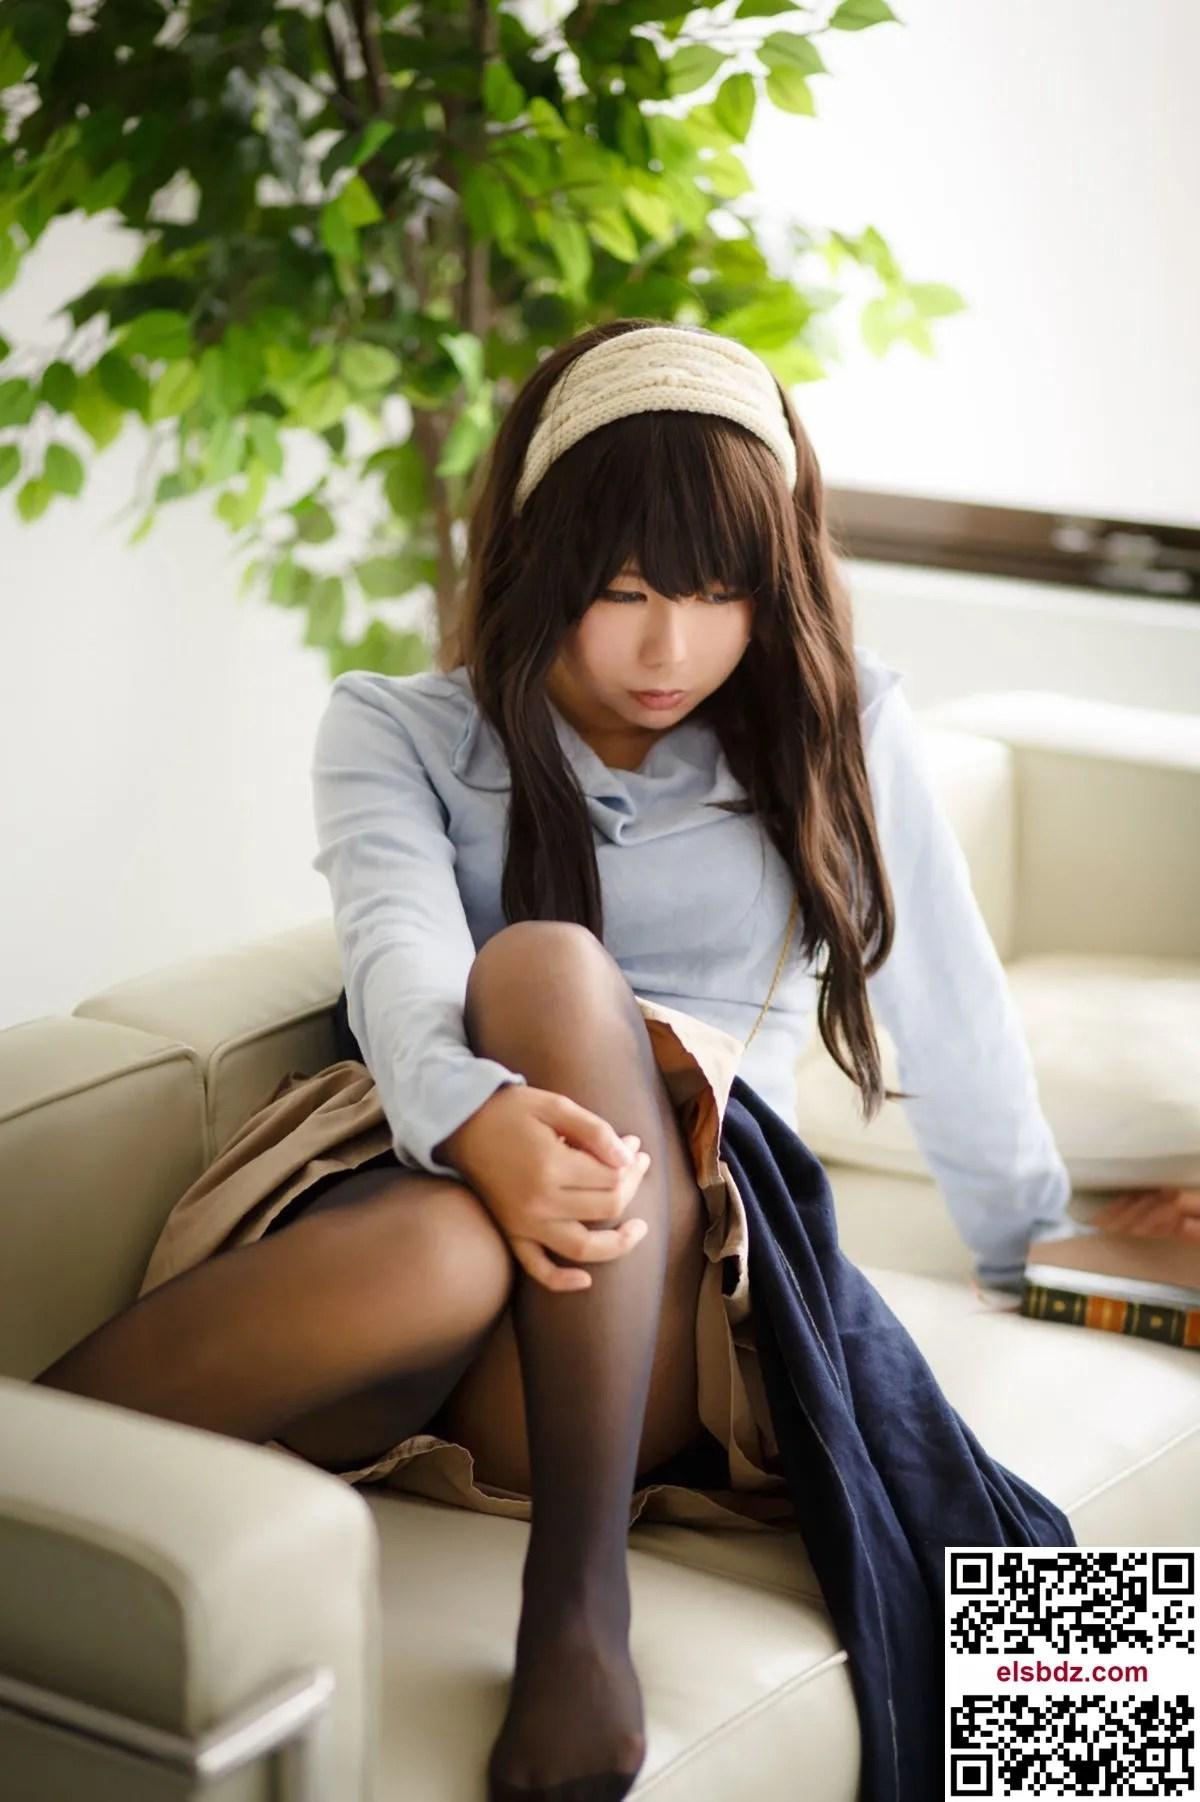 Cosplay桃馒堂Banko日常插图(3)